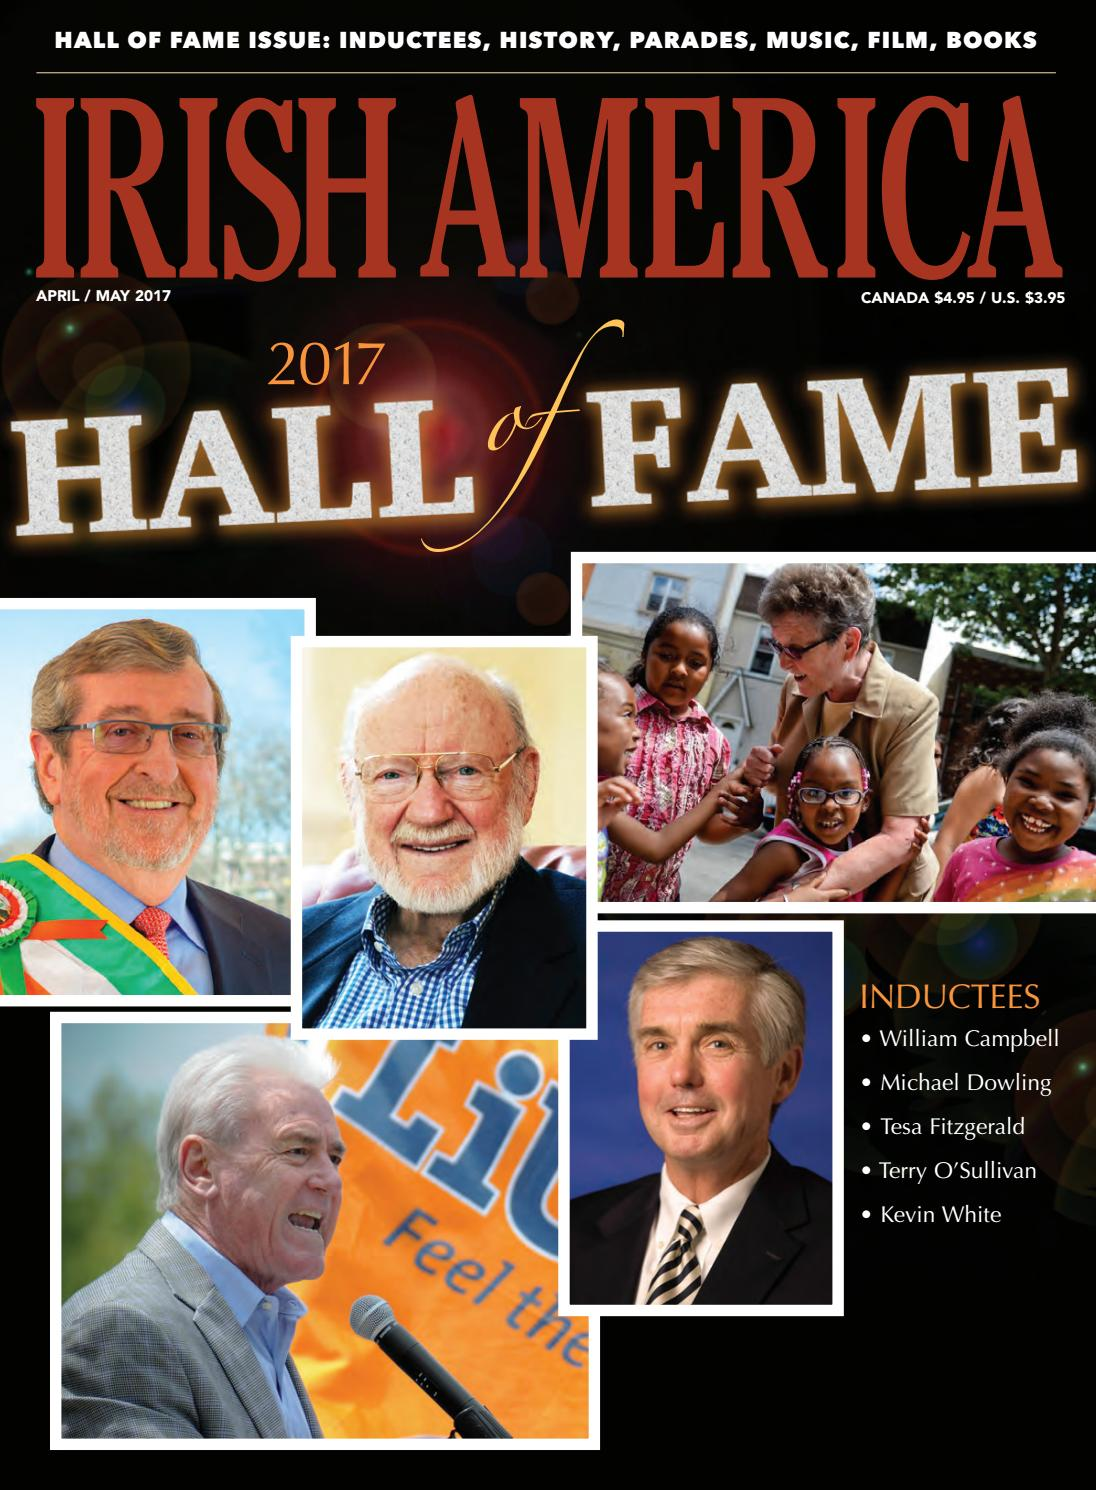 Irish America April / May 2017